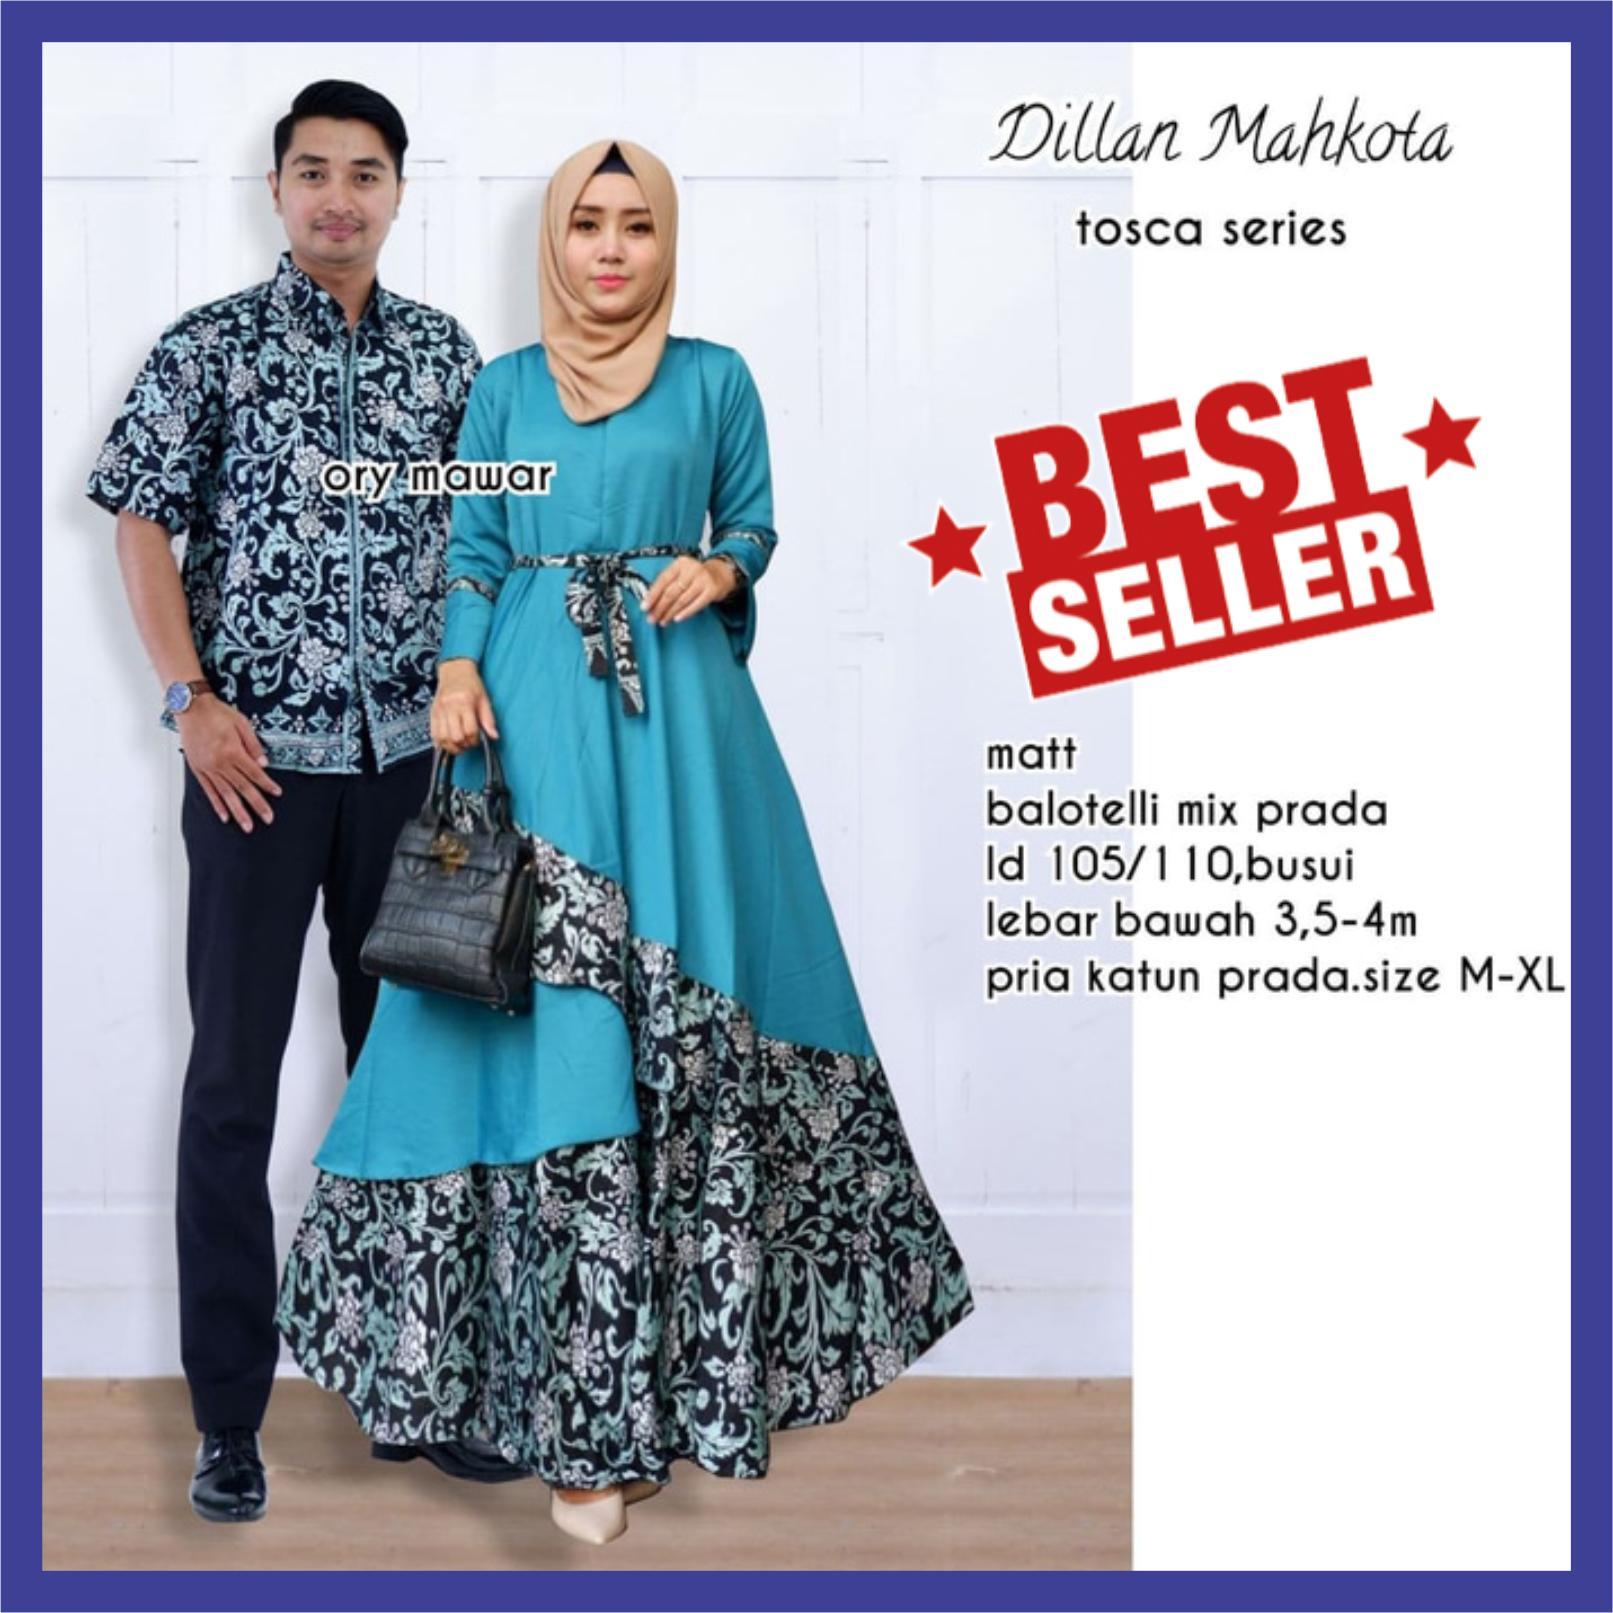 The Cheapest Price Baju Couple Batik Ayunda Etnic Latte Rp188800 Modern Sarimbit Muslim Kemeja Kondangan Dillan Mahkota